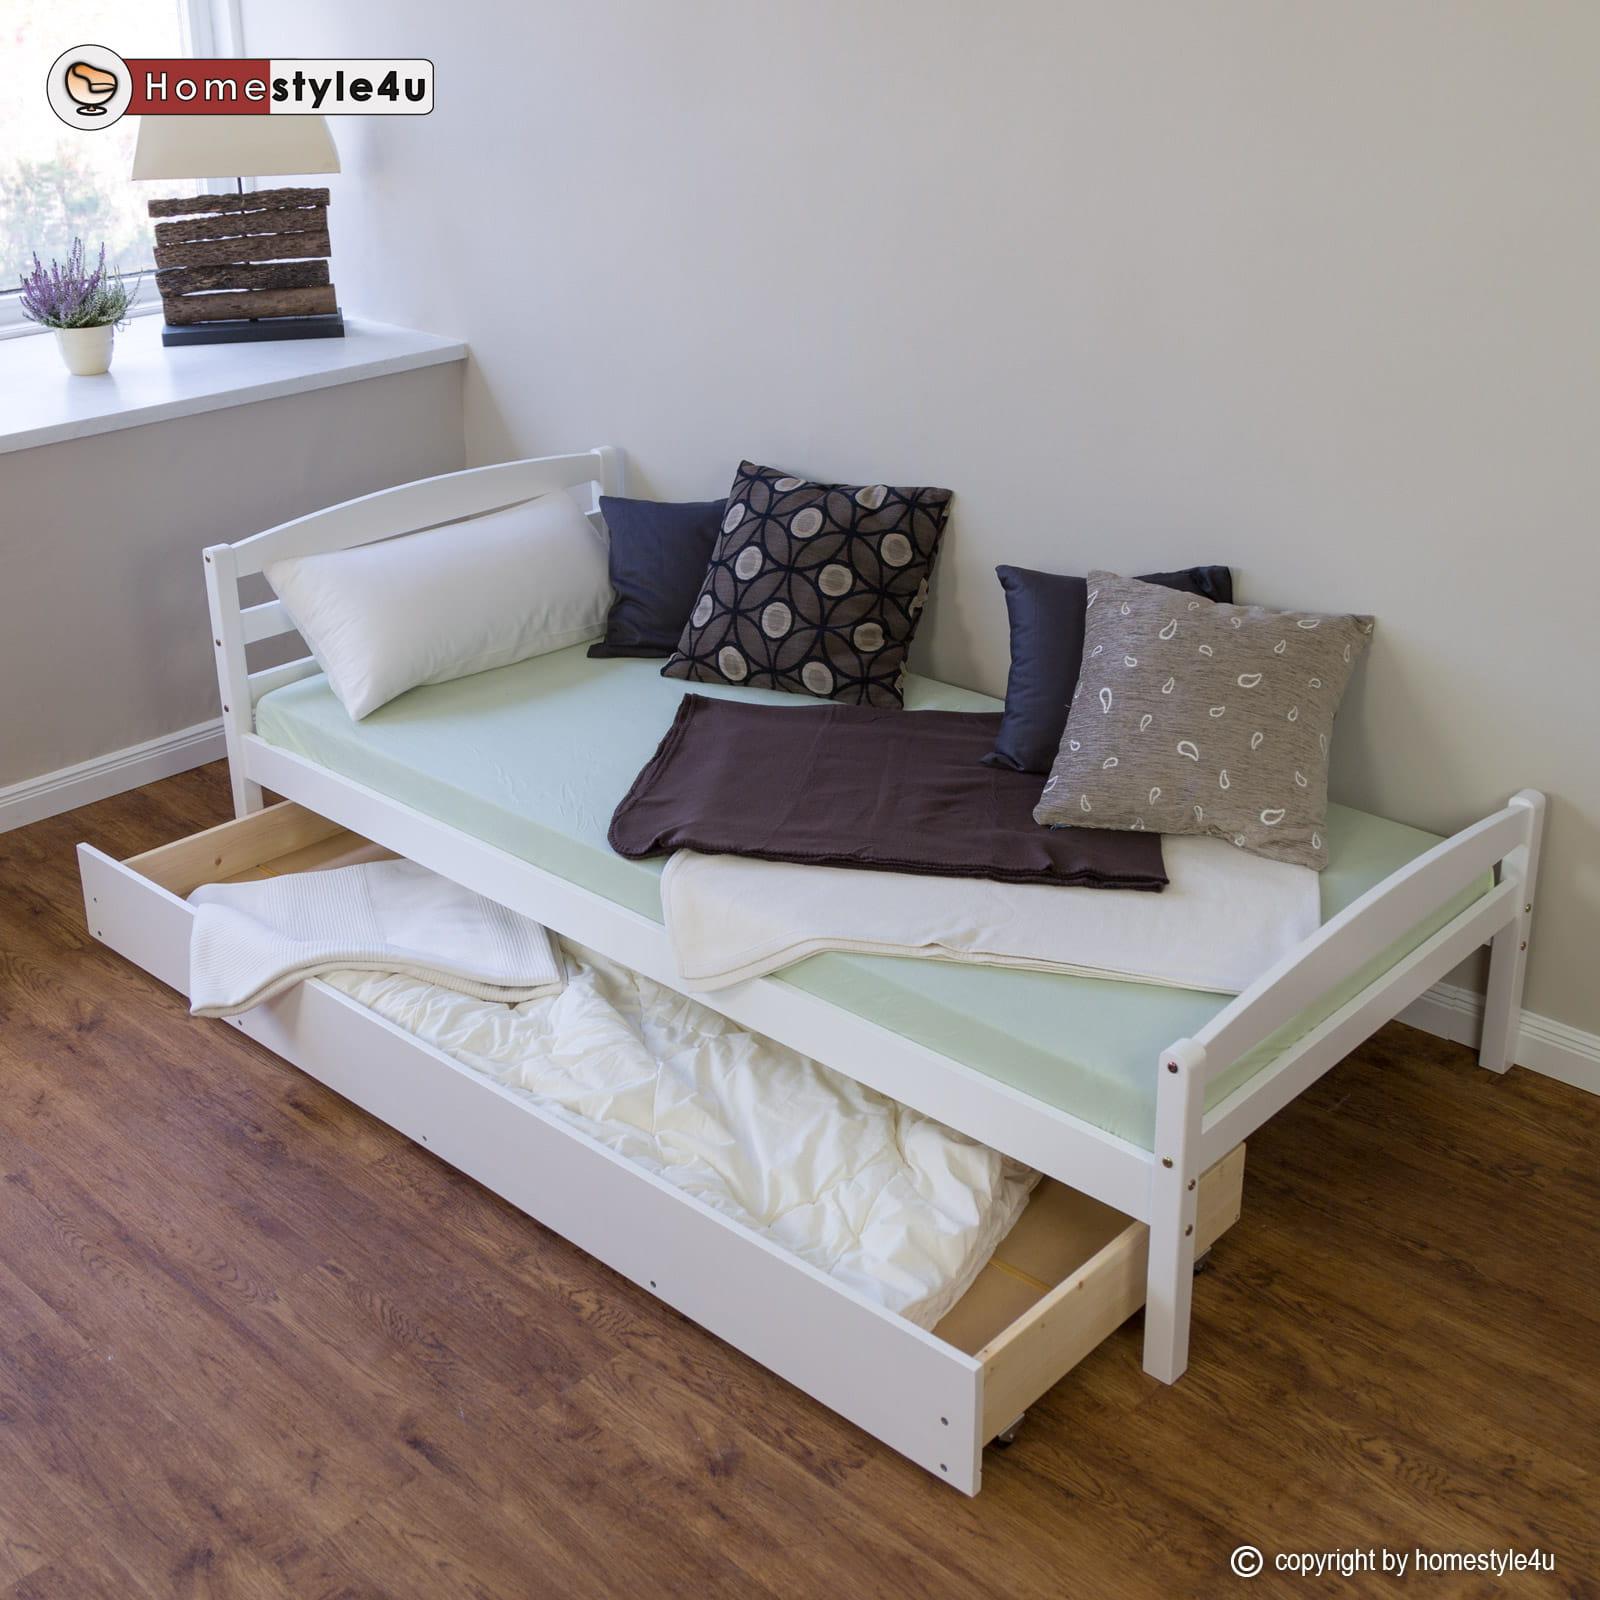 ko m odzie owe 90x200 cm rozsuwane bia e sklep. Black Bedroom Furniture Sets. Home Design Ideas